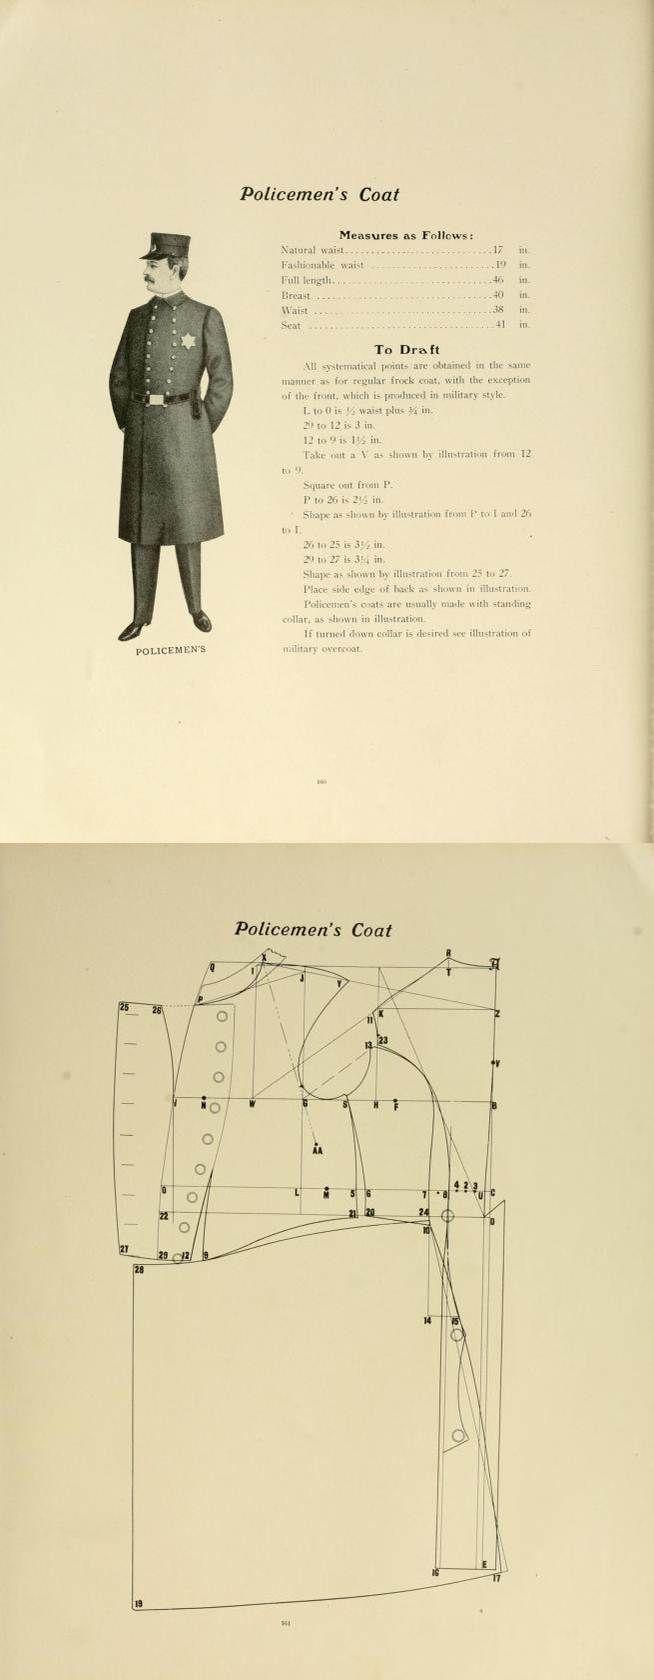 1907 Policemen's coat pattern